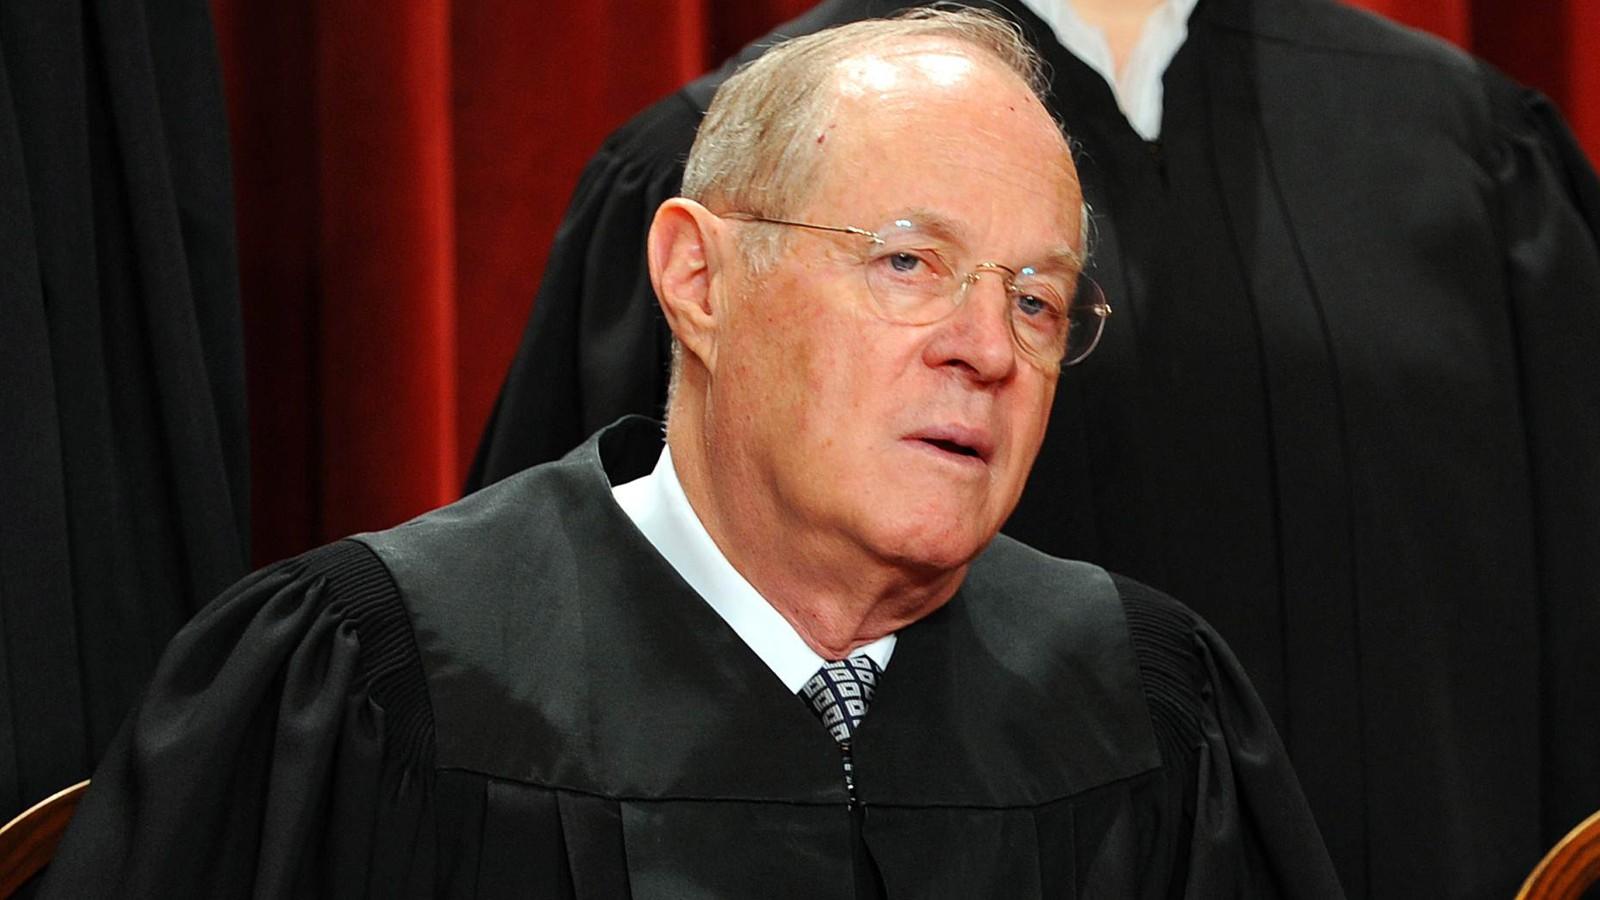 Politics And Justice >> Justice Anthony Kennedy's evolution on affirmative action - CNNPolitics